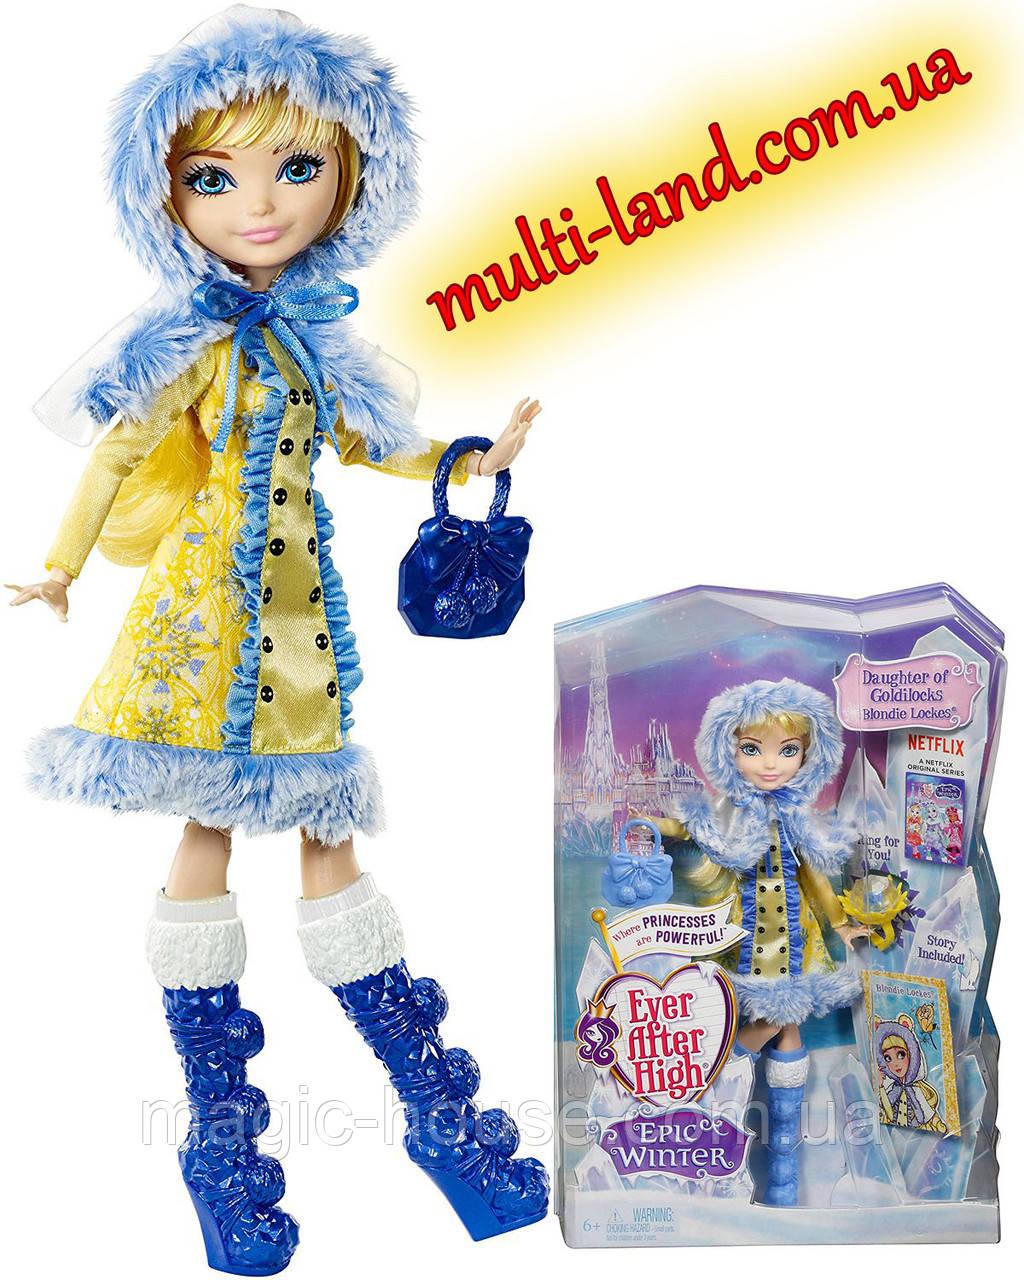 Блонди Локс Кукла Эвер Афтер Хай Эпическая Зима Ever After High Epic Winter Blondie Lockes Doll